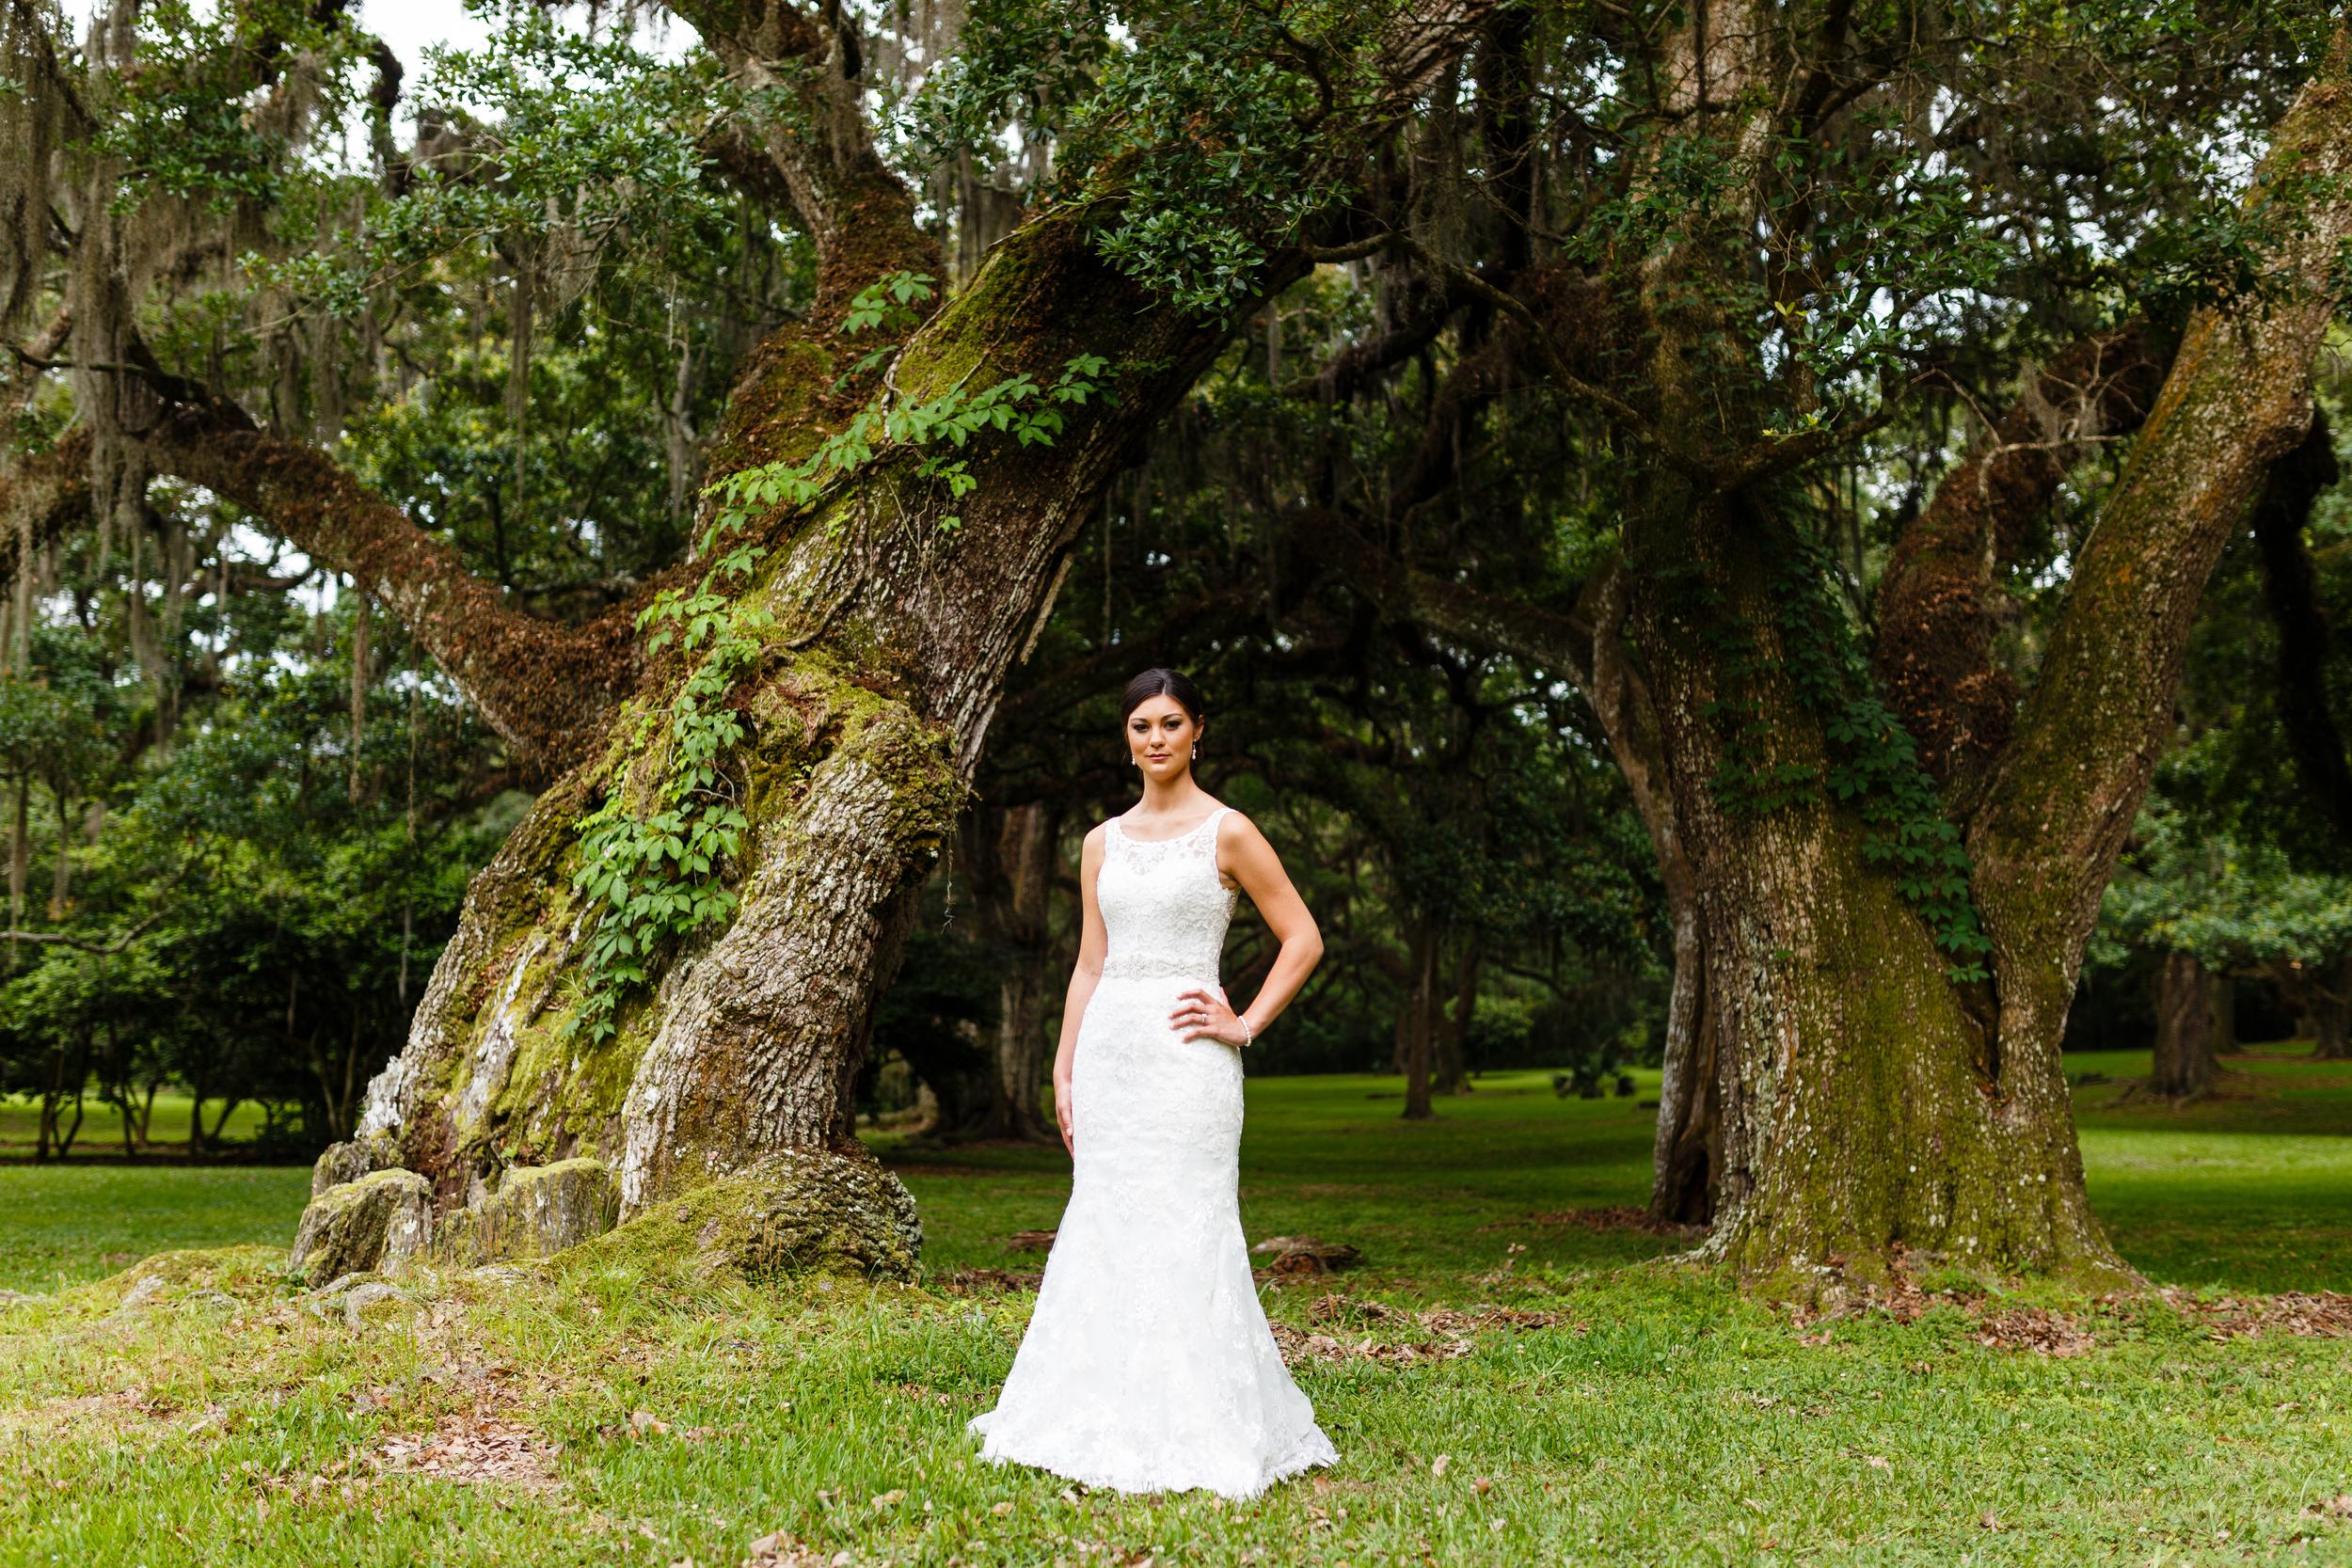 Bridal-wedding-portrait-lafayette-broussard-youngsville-photographer-1-4.jpg